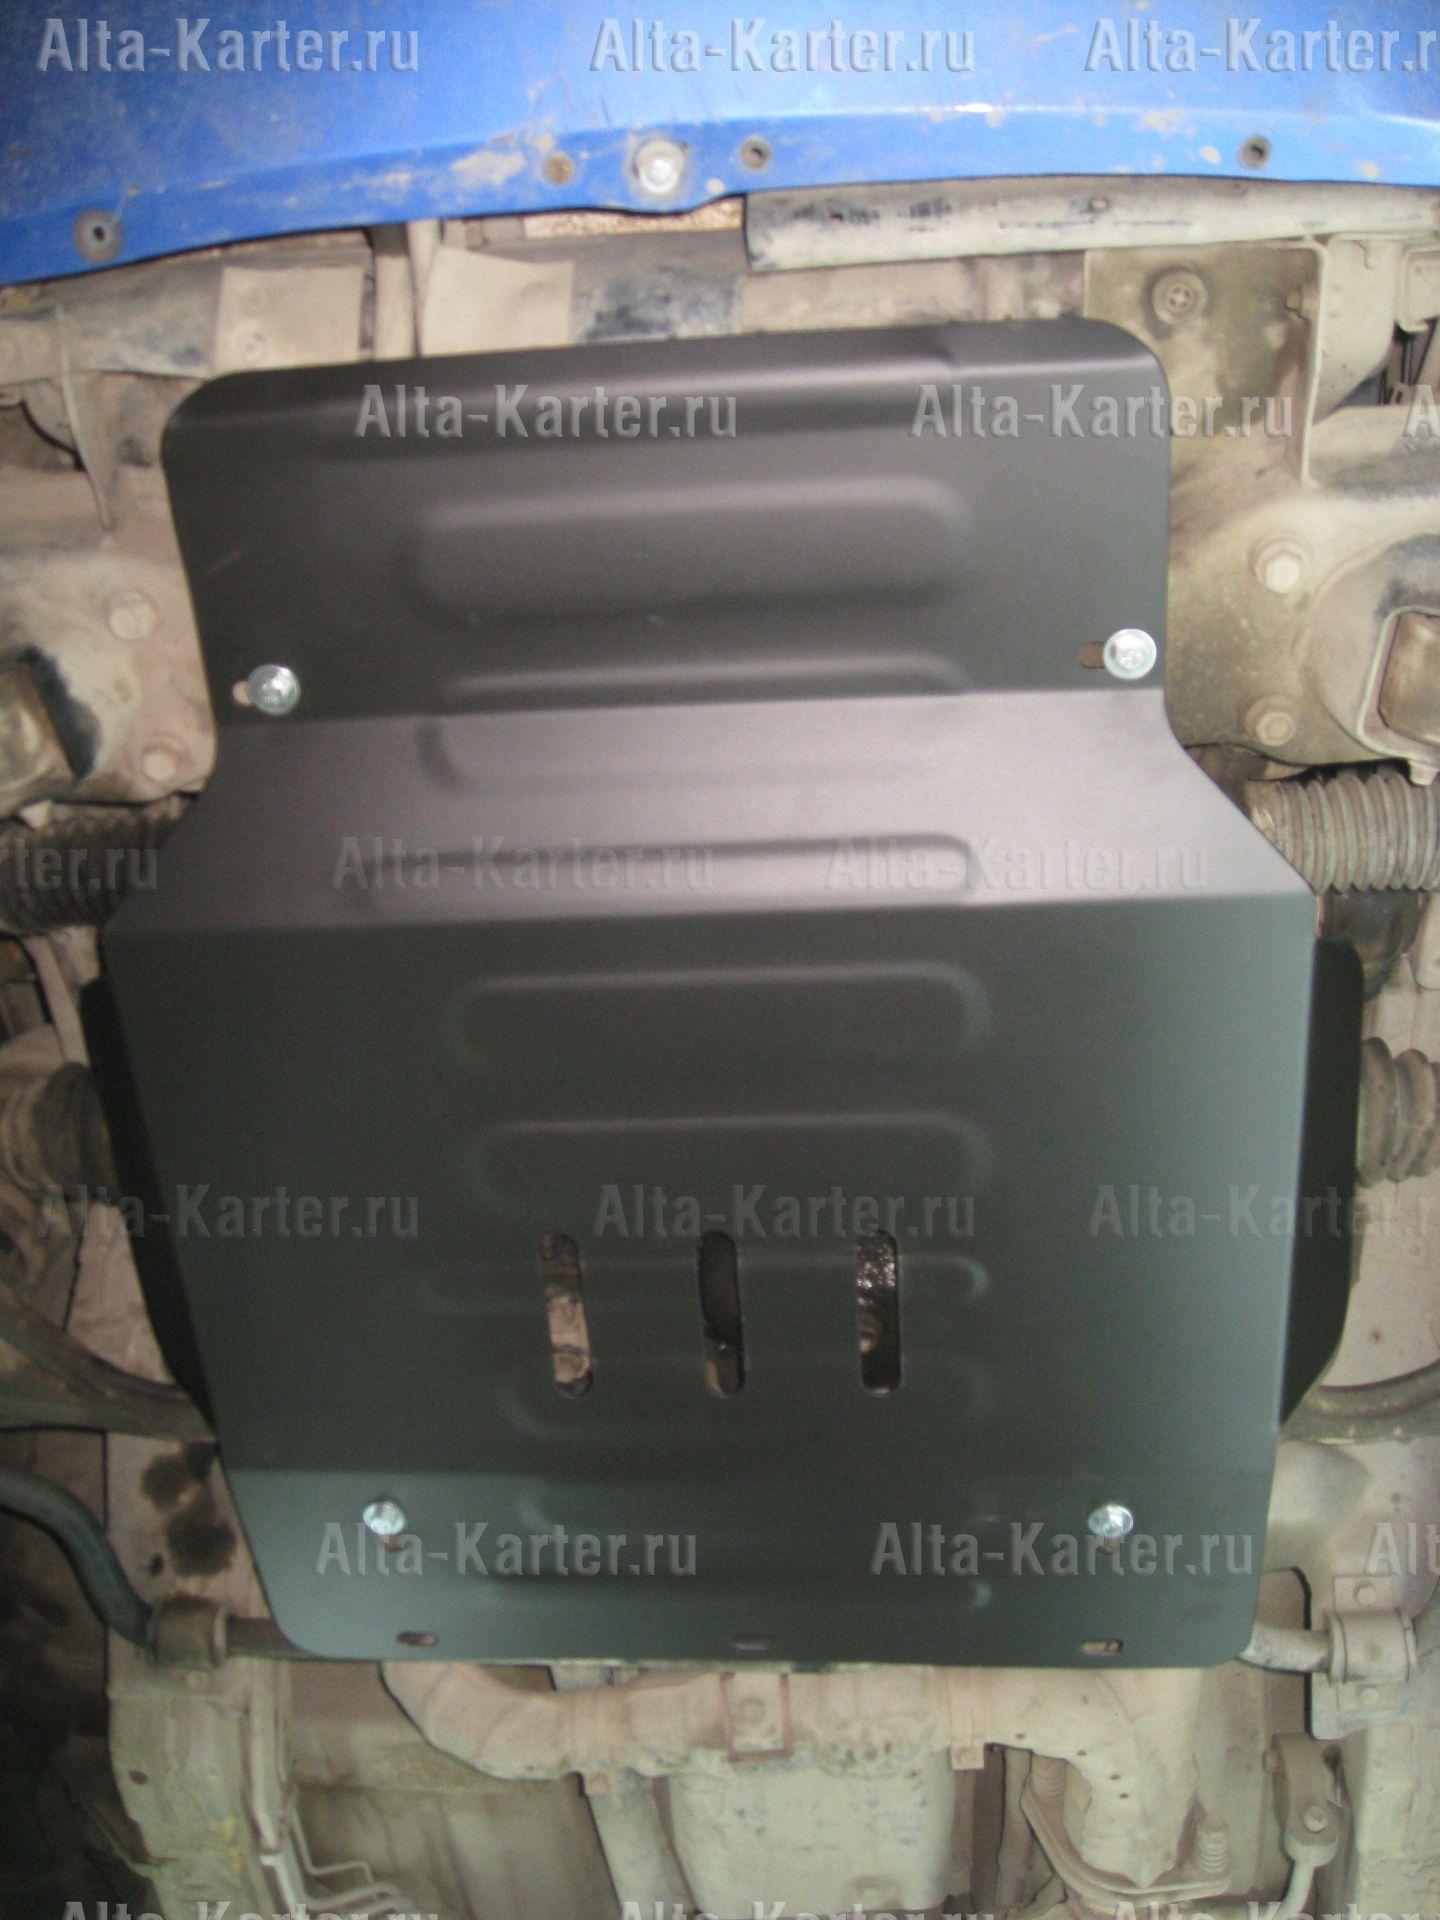 Защита Alfeco для картера Suzuki Grand Vitara XL-7 1999-2005. Артикул ALF.23.12